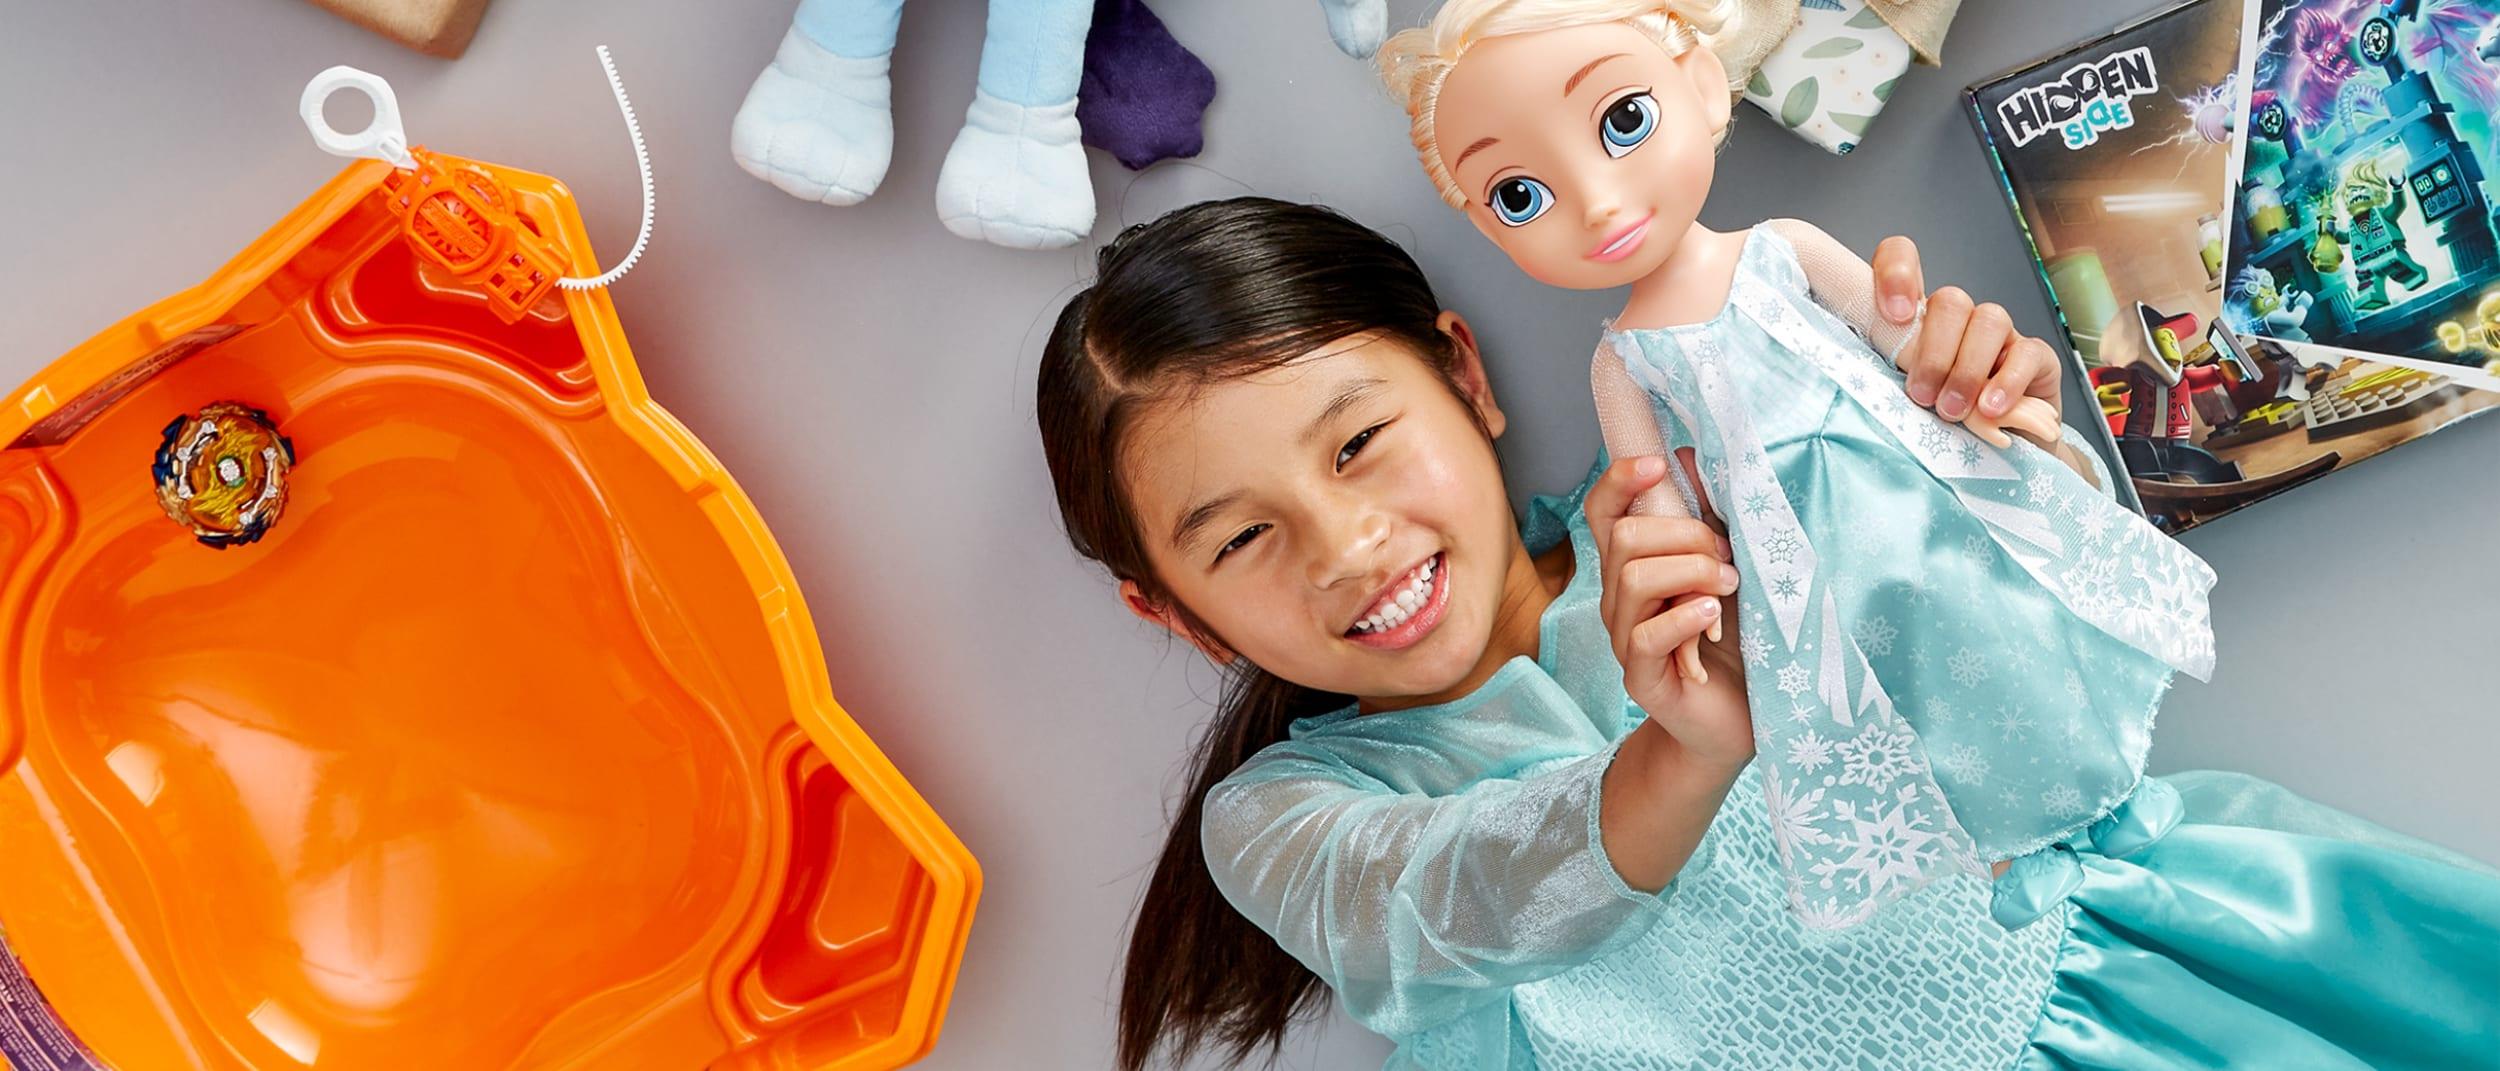 Target: 20% off big brand toy sale